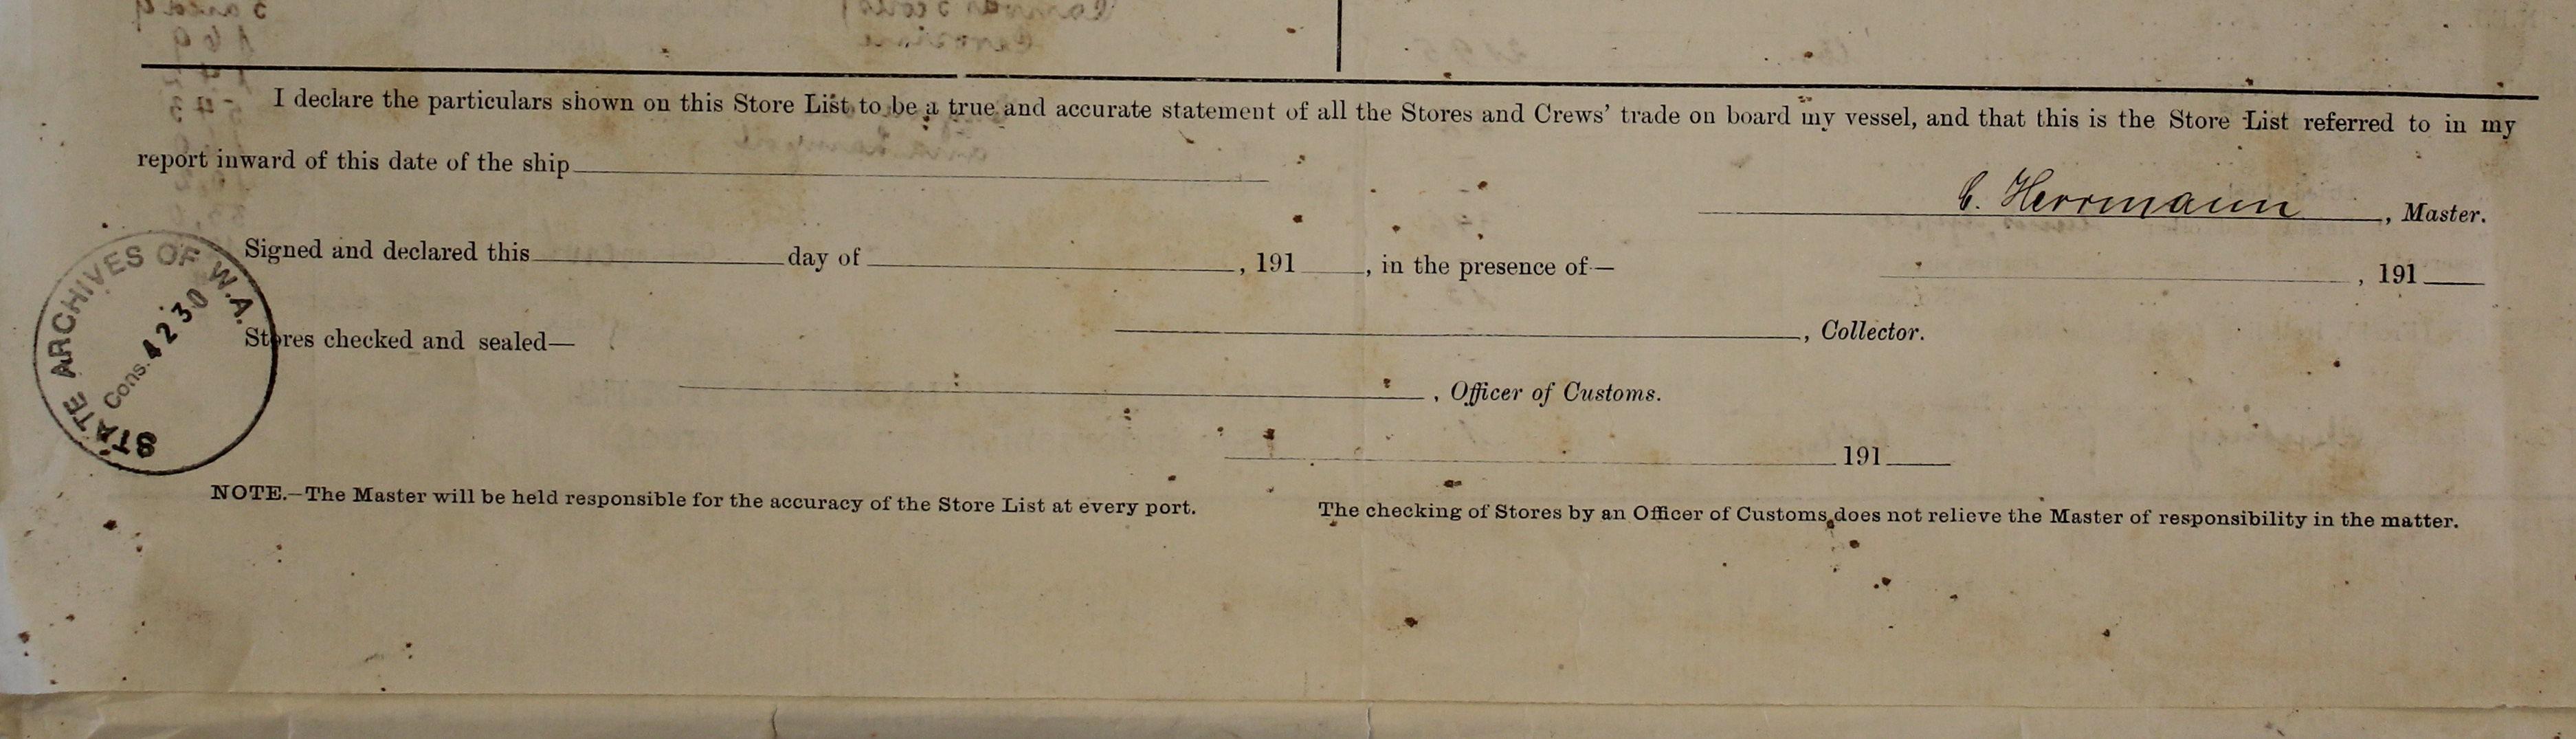 Australian Customs, store list, 1914